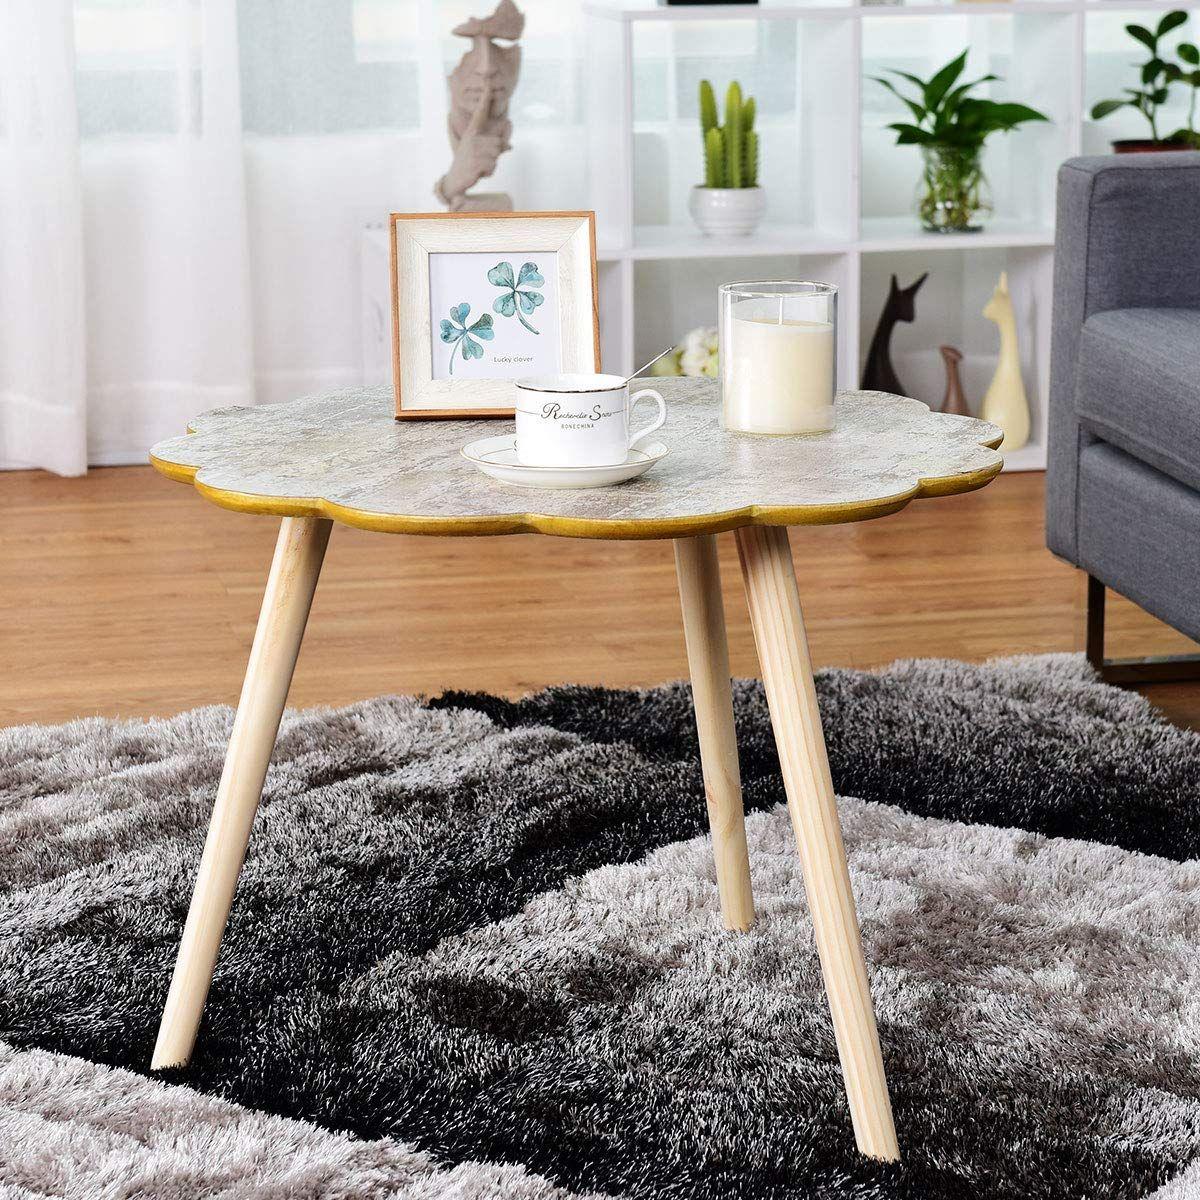 Giantex Nesting Table Flower Shaped Coffee Table Sofa Side Table